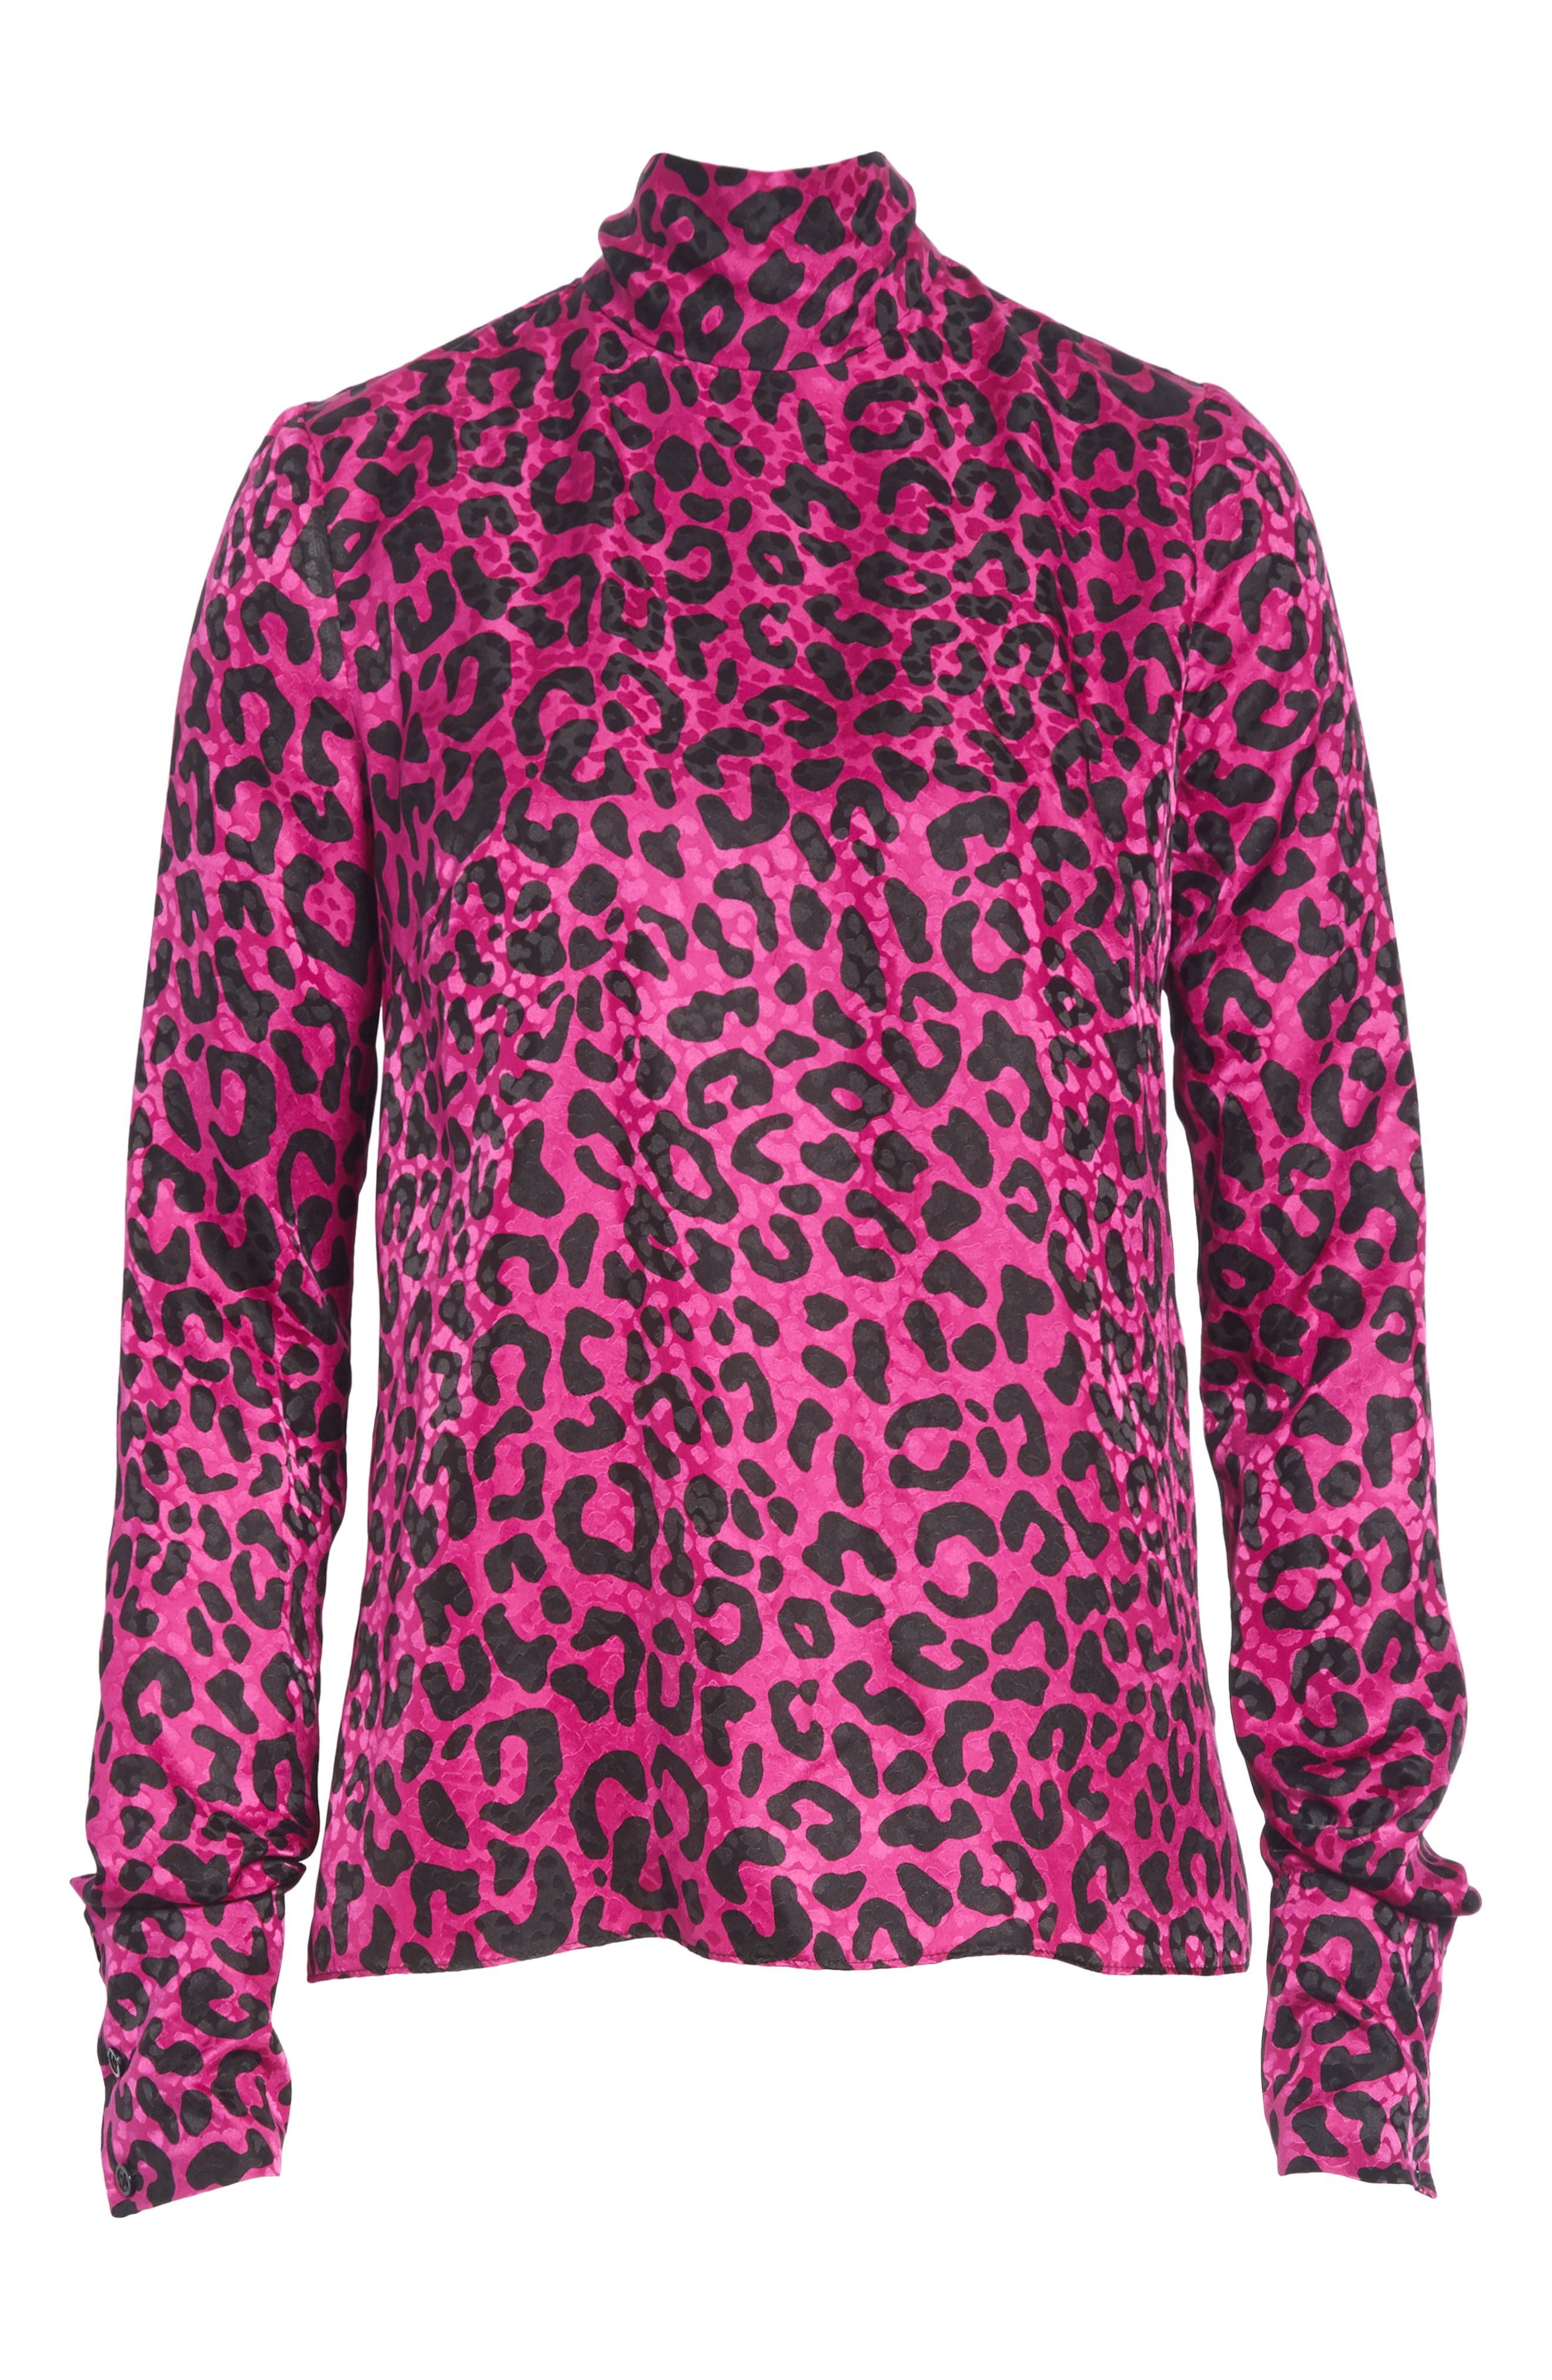 Leopard Print Silk Jacquard Top,                             Alternate thumbnail 6, color,                             673